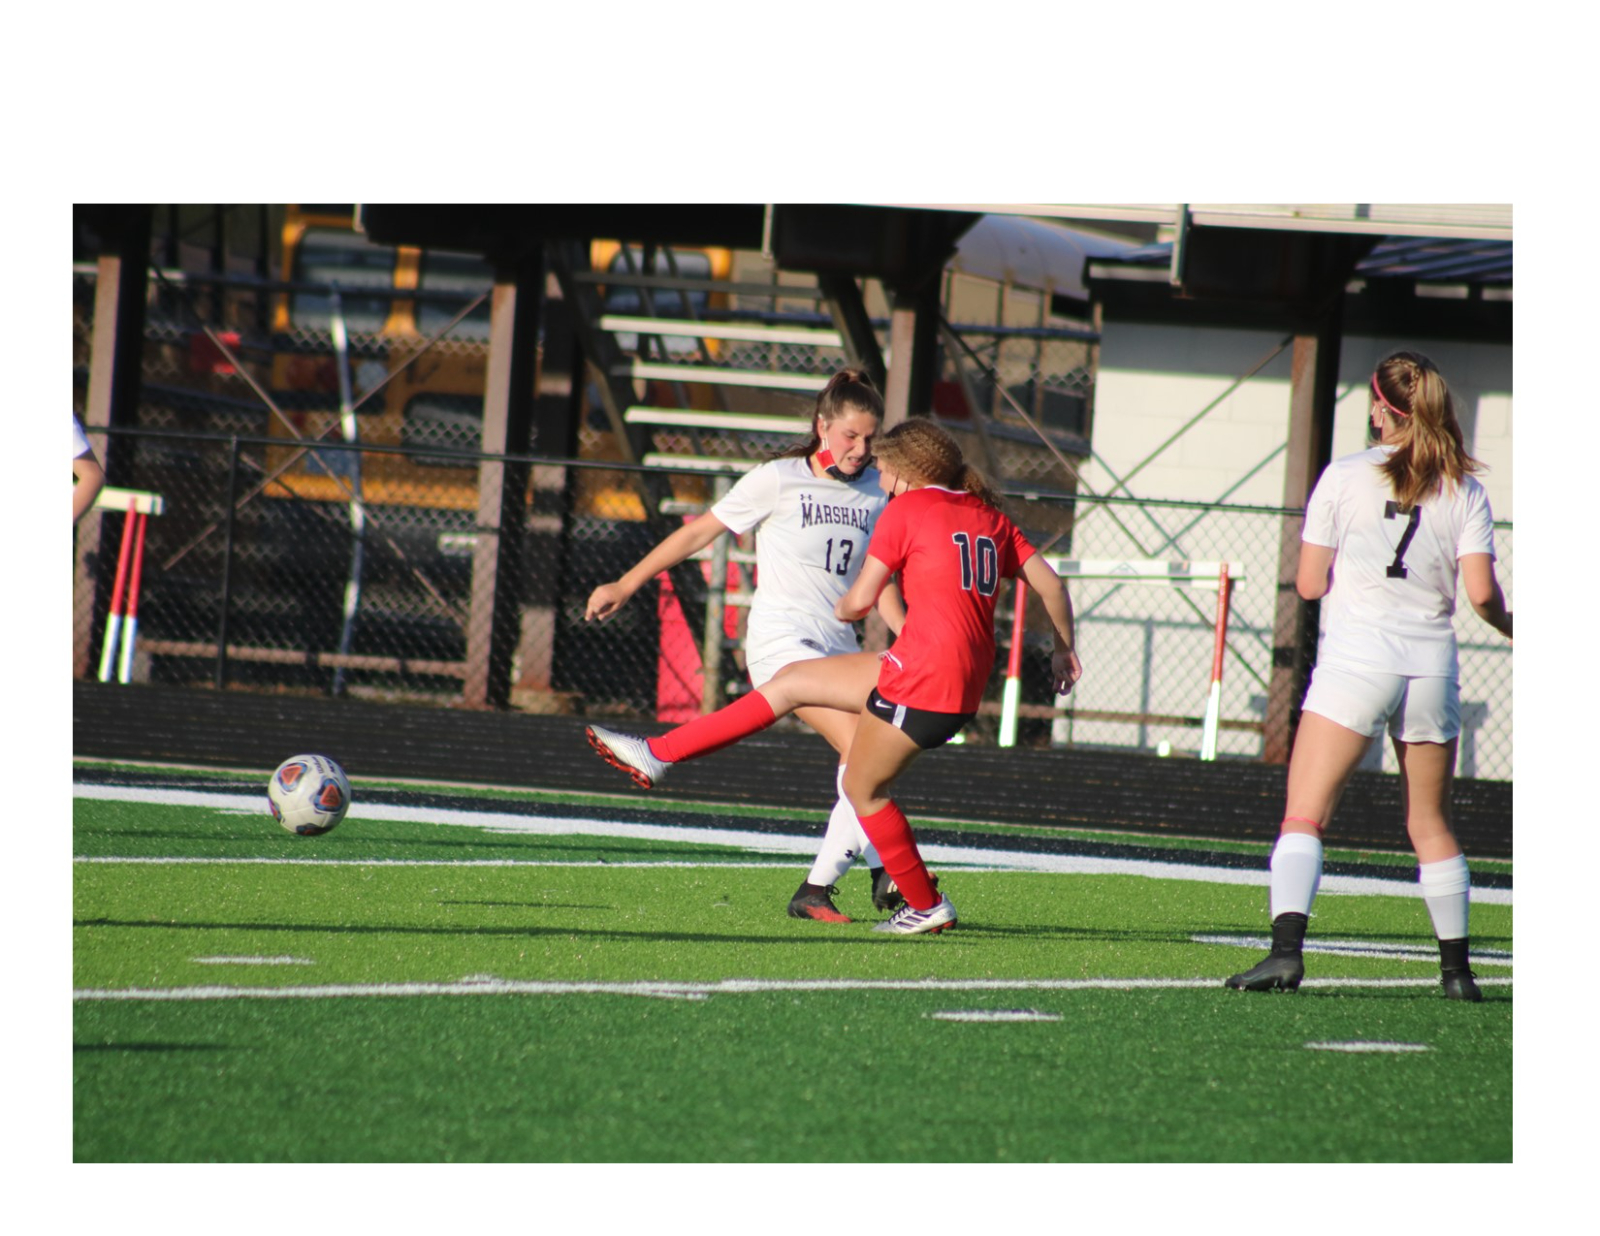 Vars. Girls' Soccer vs. Marshall – PHOTO GALLERY